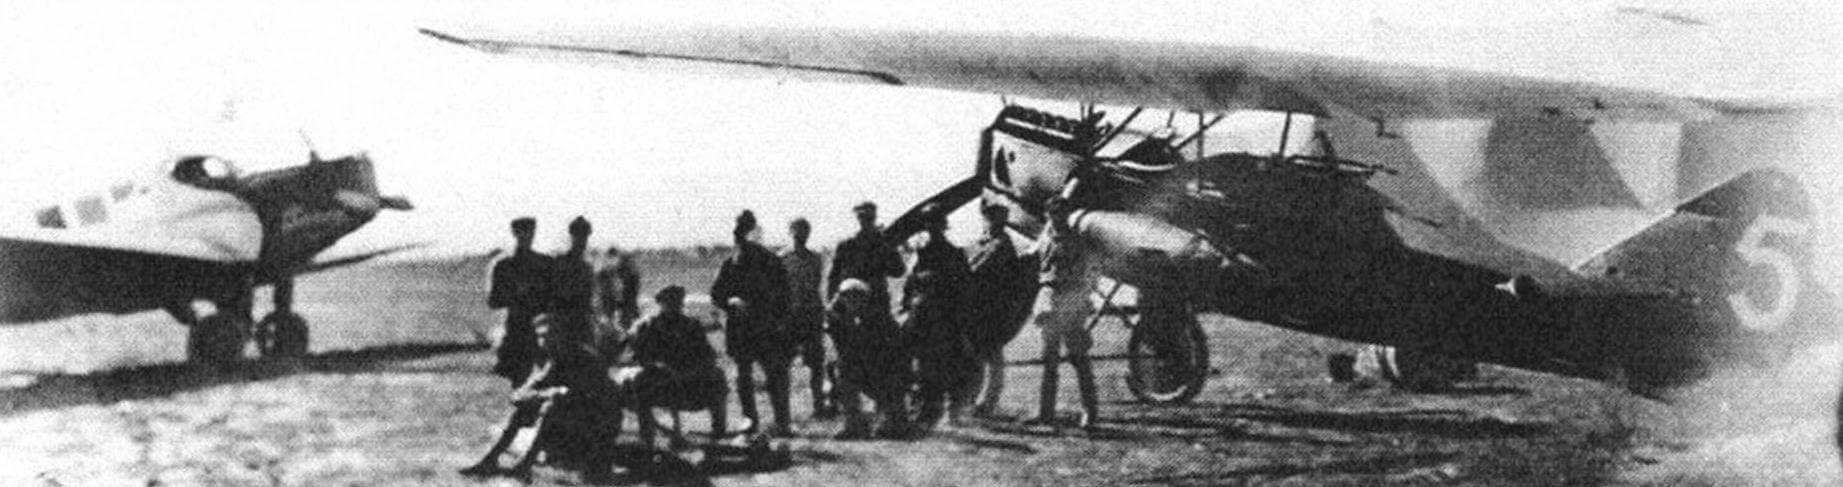 На аэродроме стоят пассажирский Ю-13 (слева) и разведчик Ю-21 (справа)